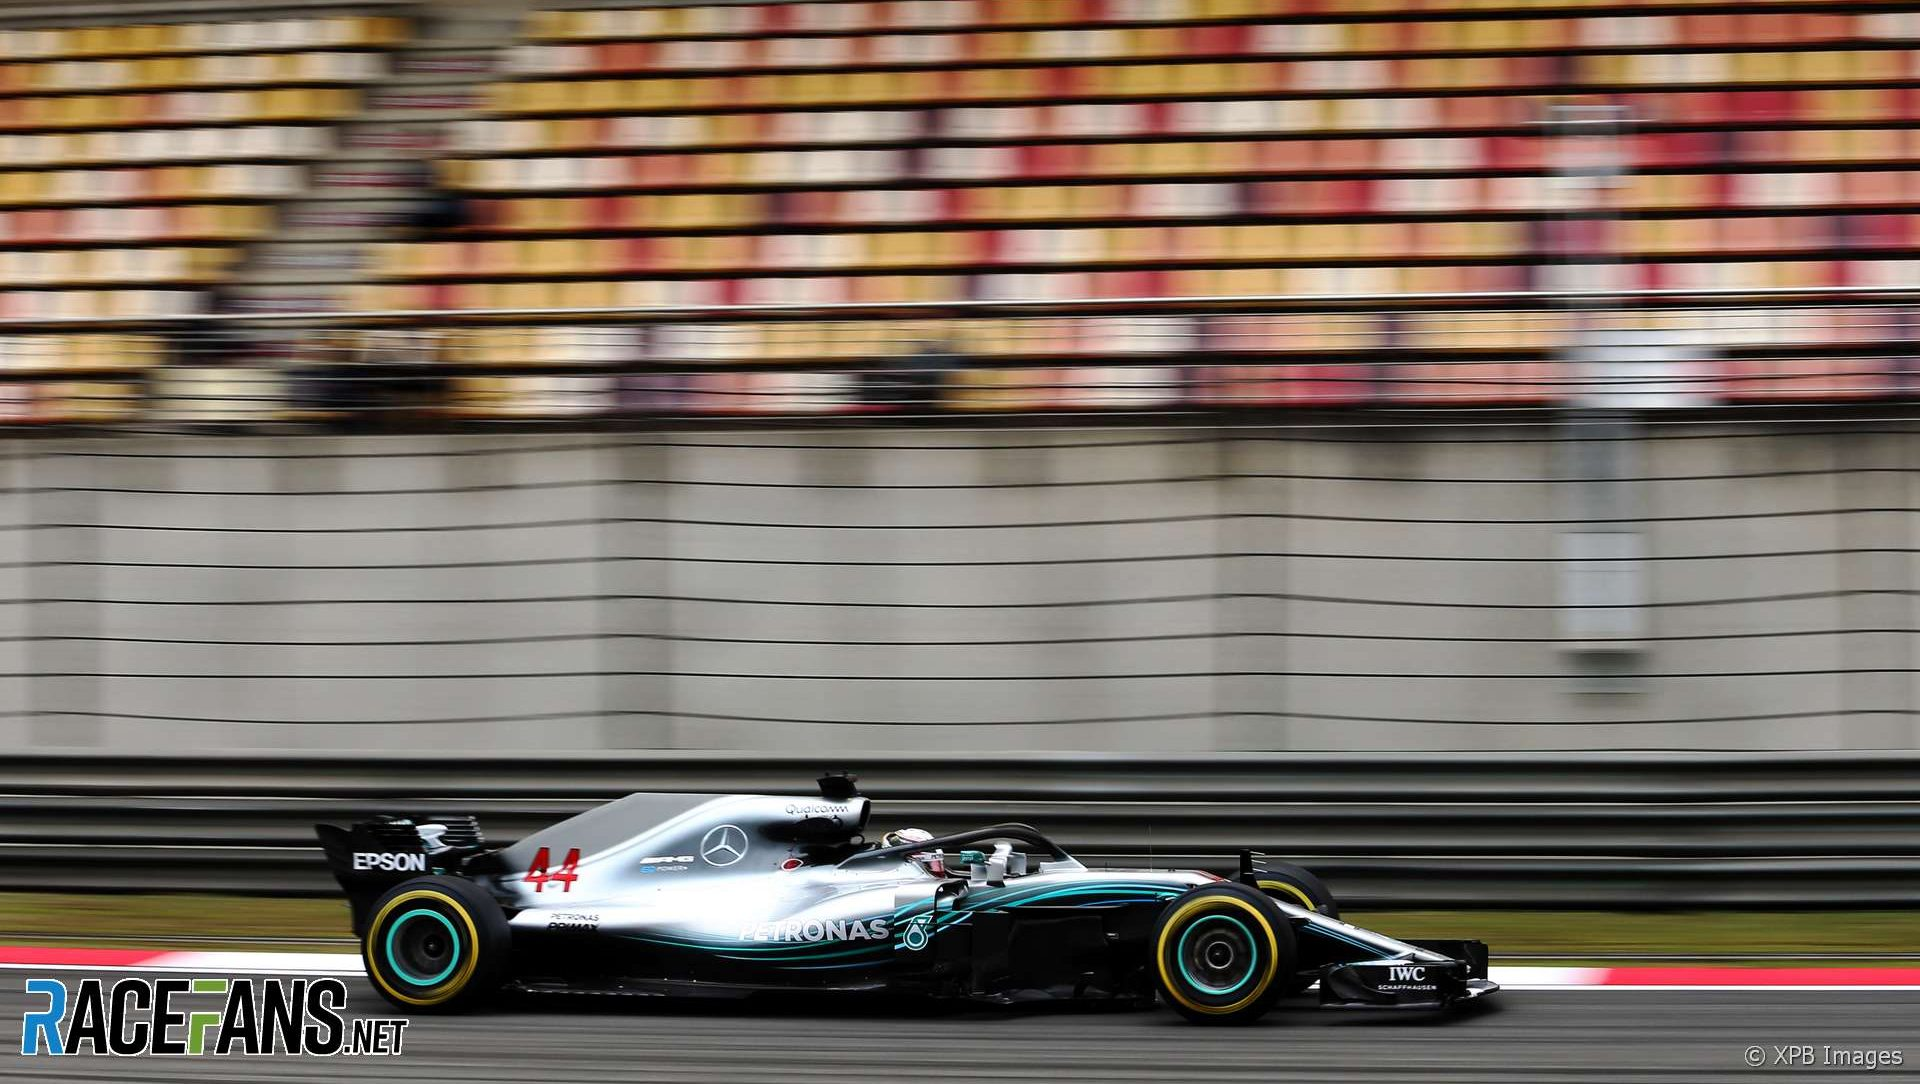 Lewis Hamilton, Mercedes, Shanghai International Circuit, 2018